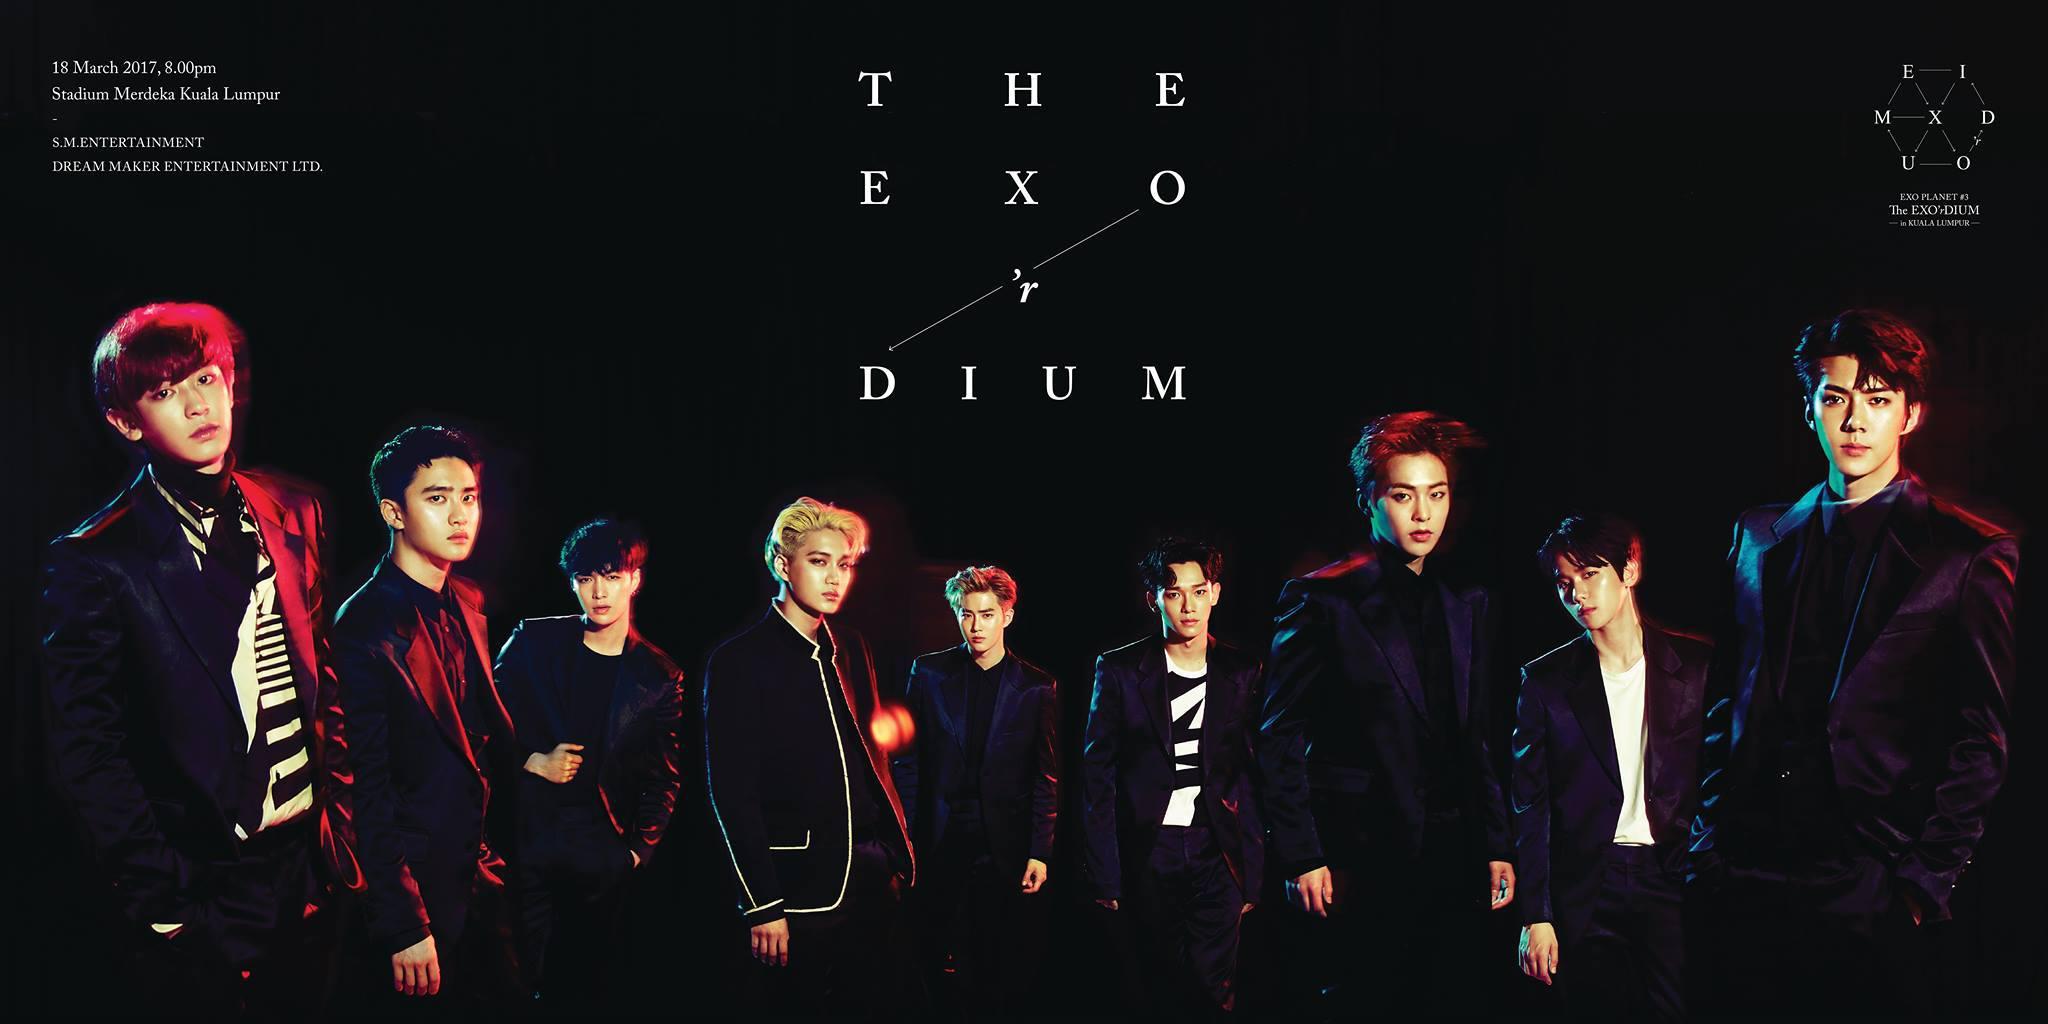 EXO The EXO'rdium Kuala Lumpur poster.png